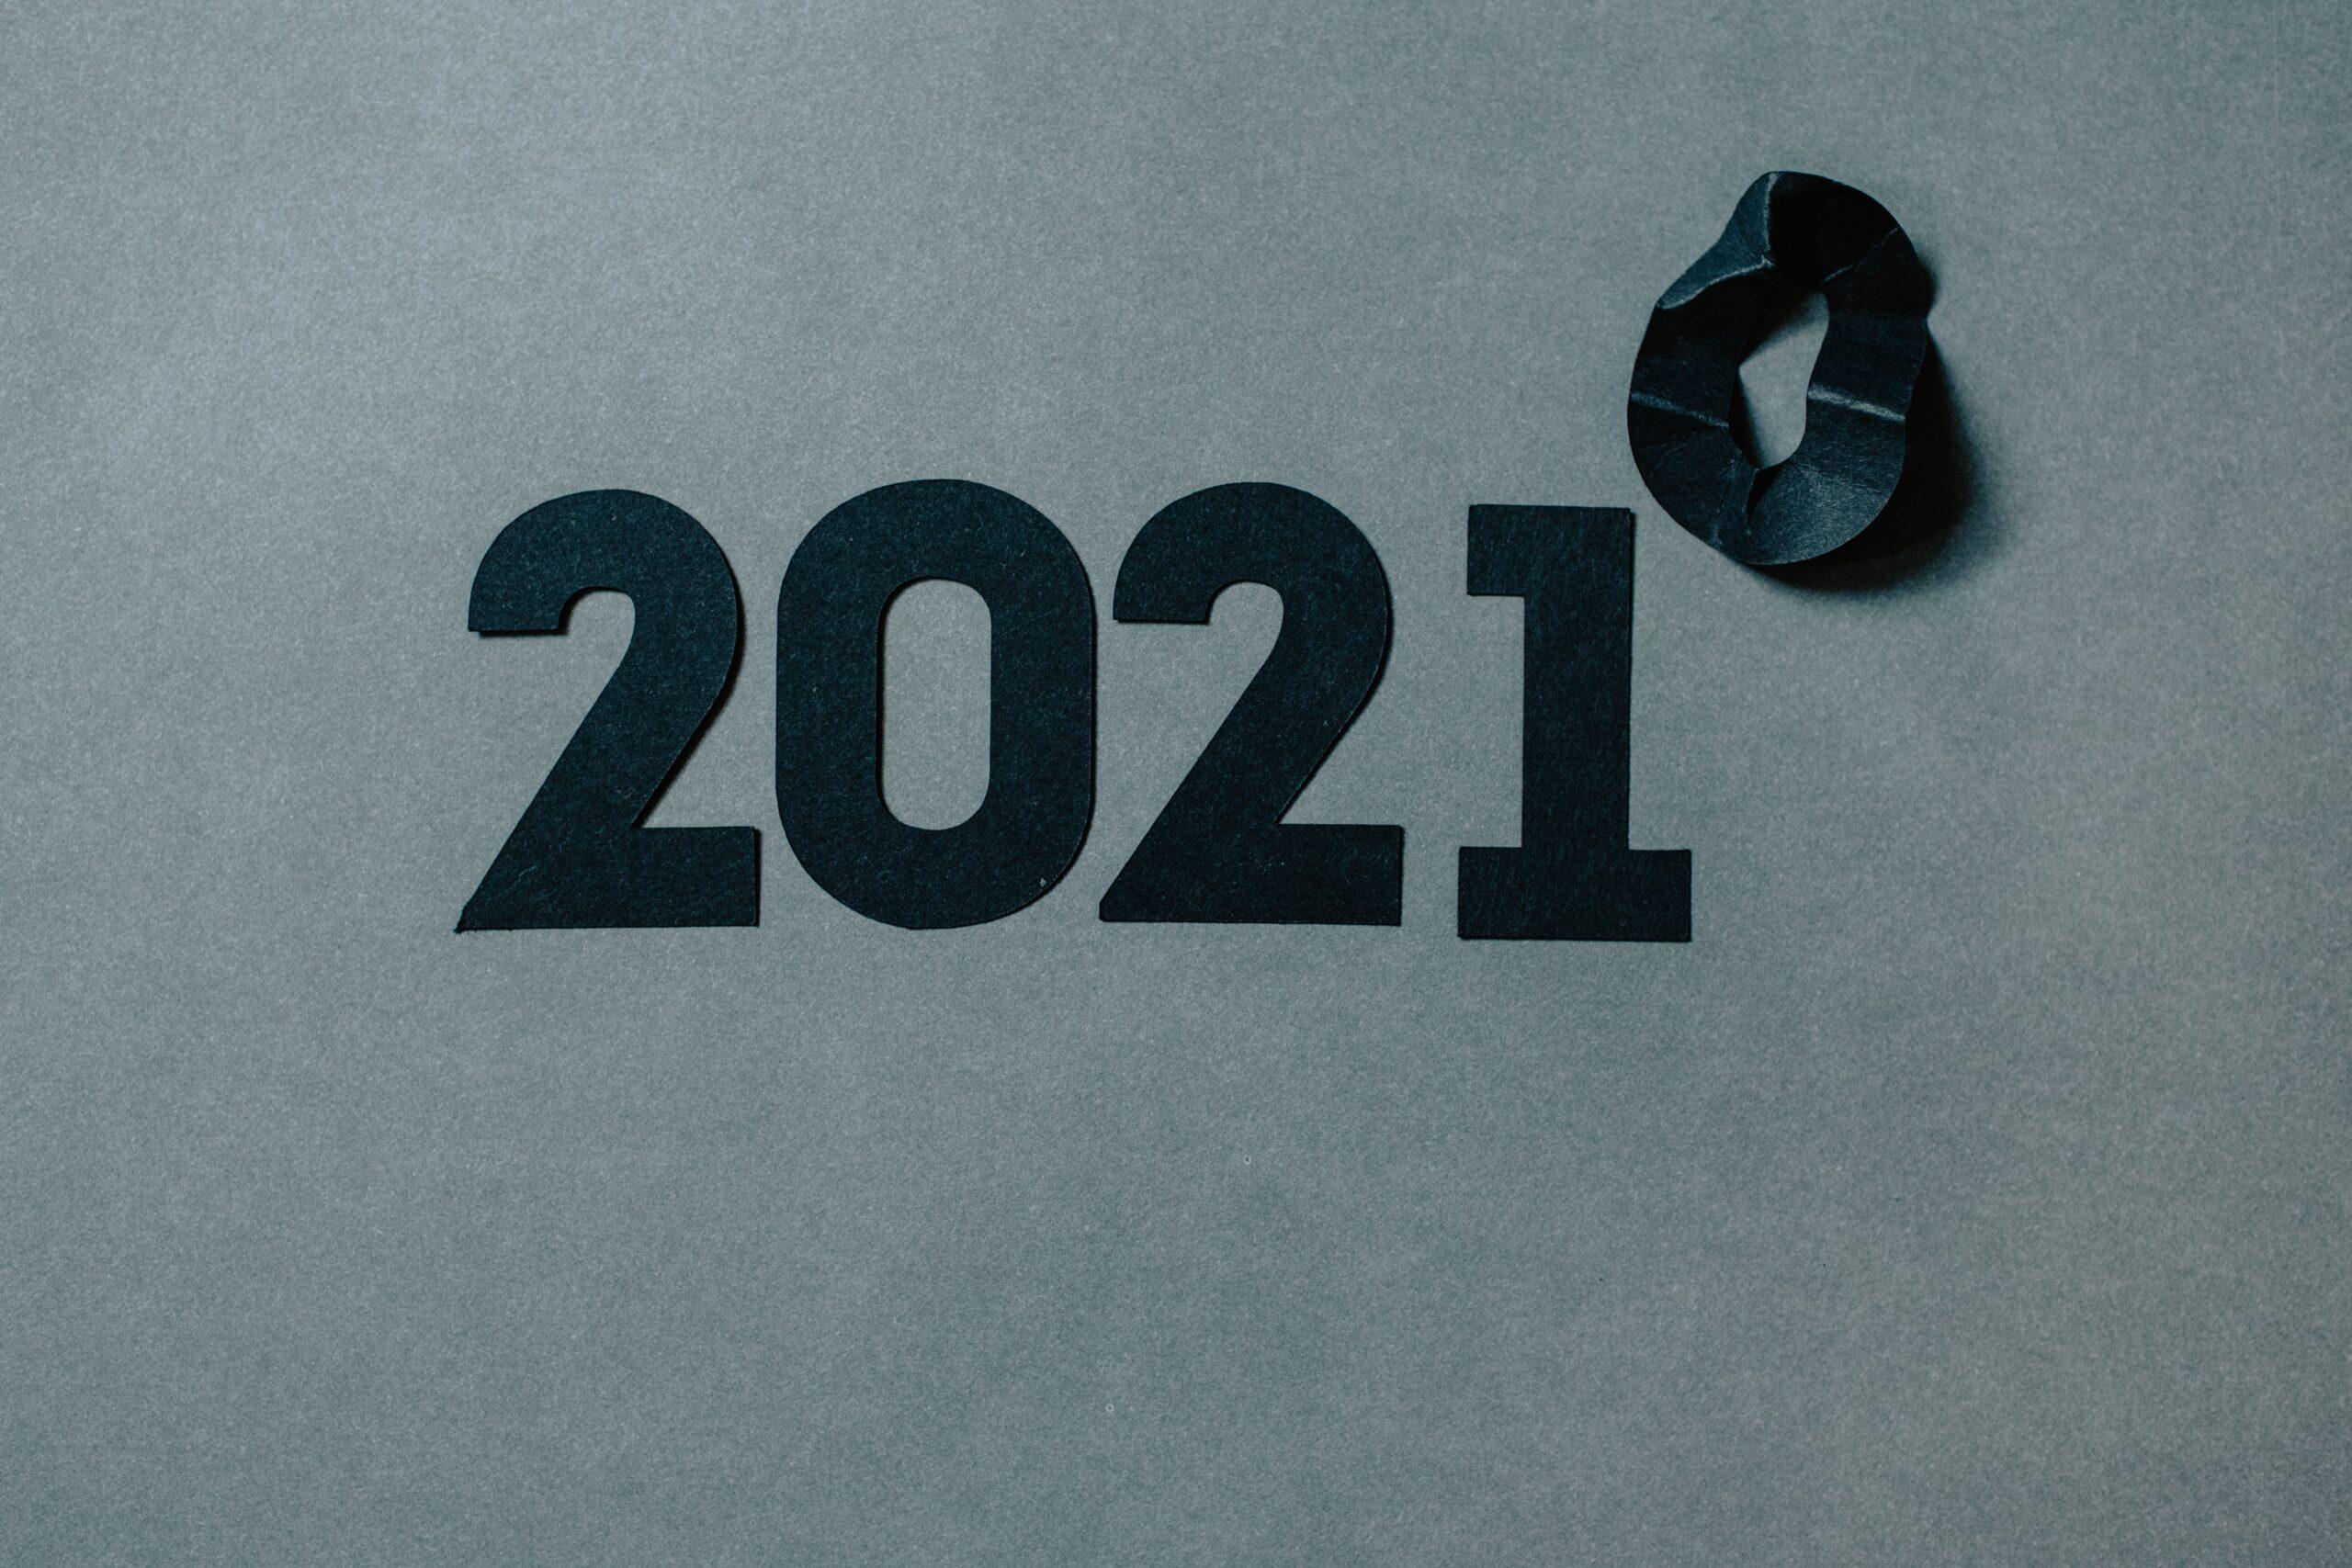 2020-2021